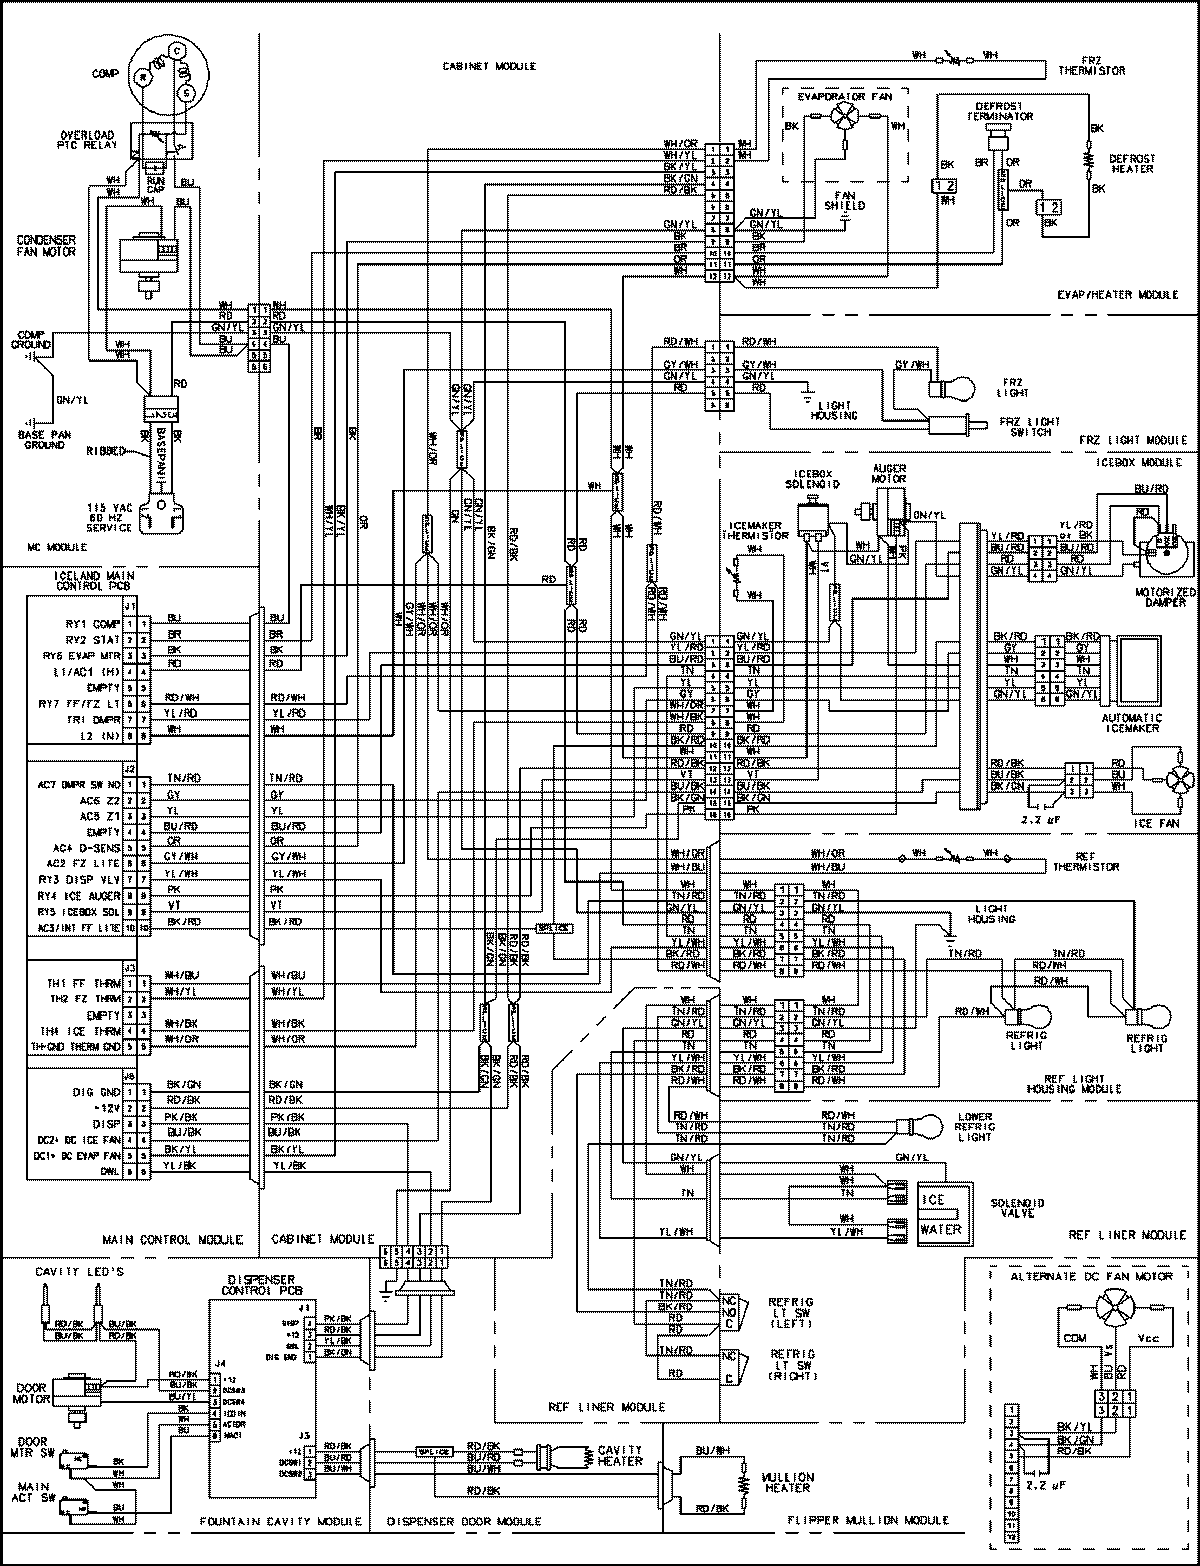 medium resolution of whirlpool refrigerator wiring diagram